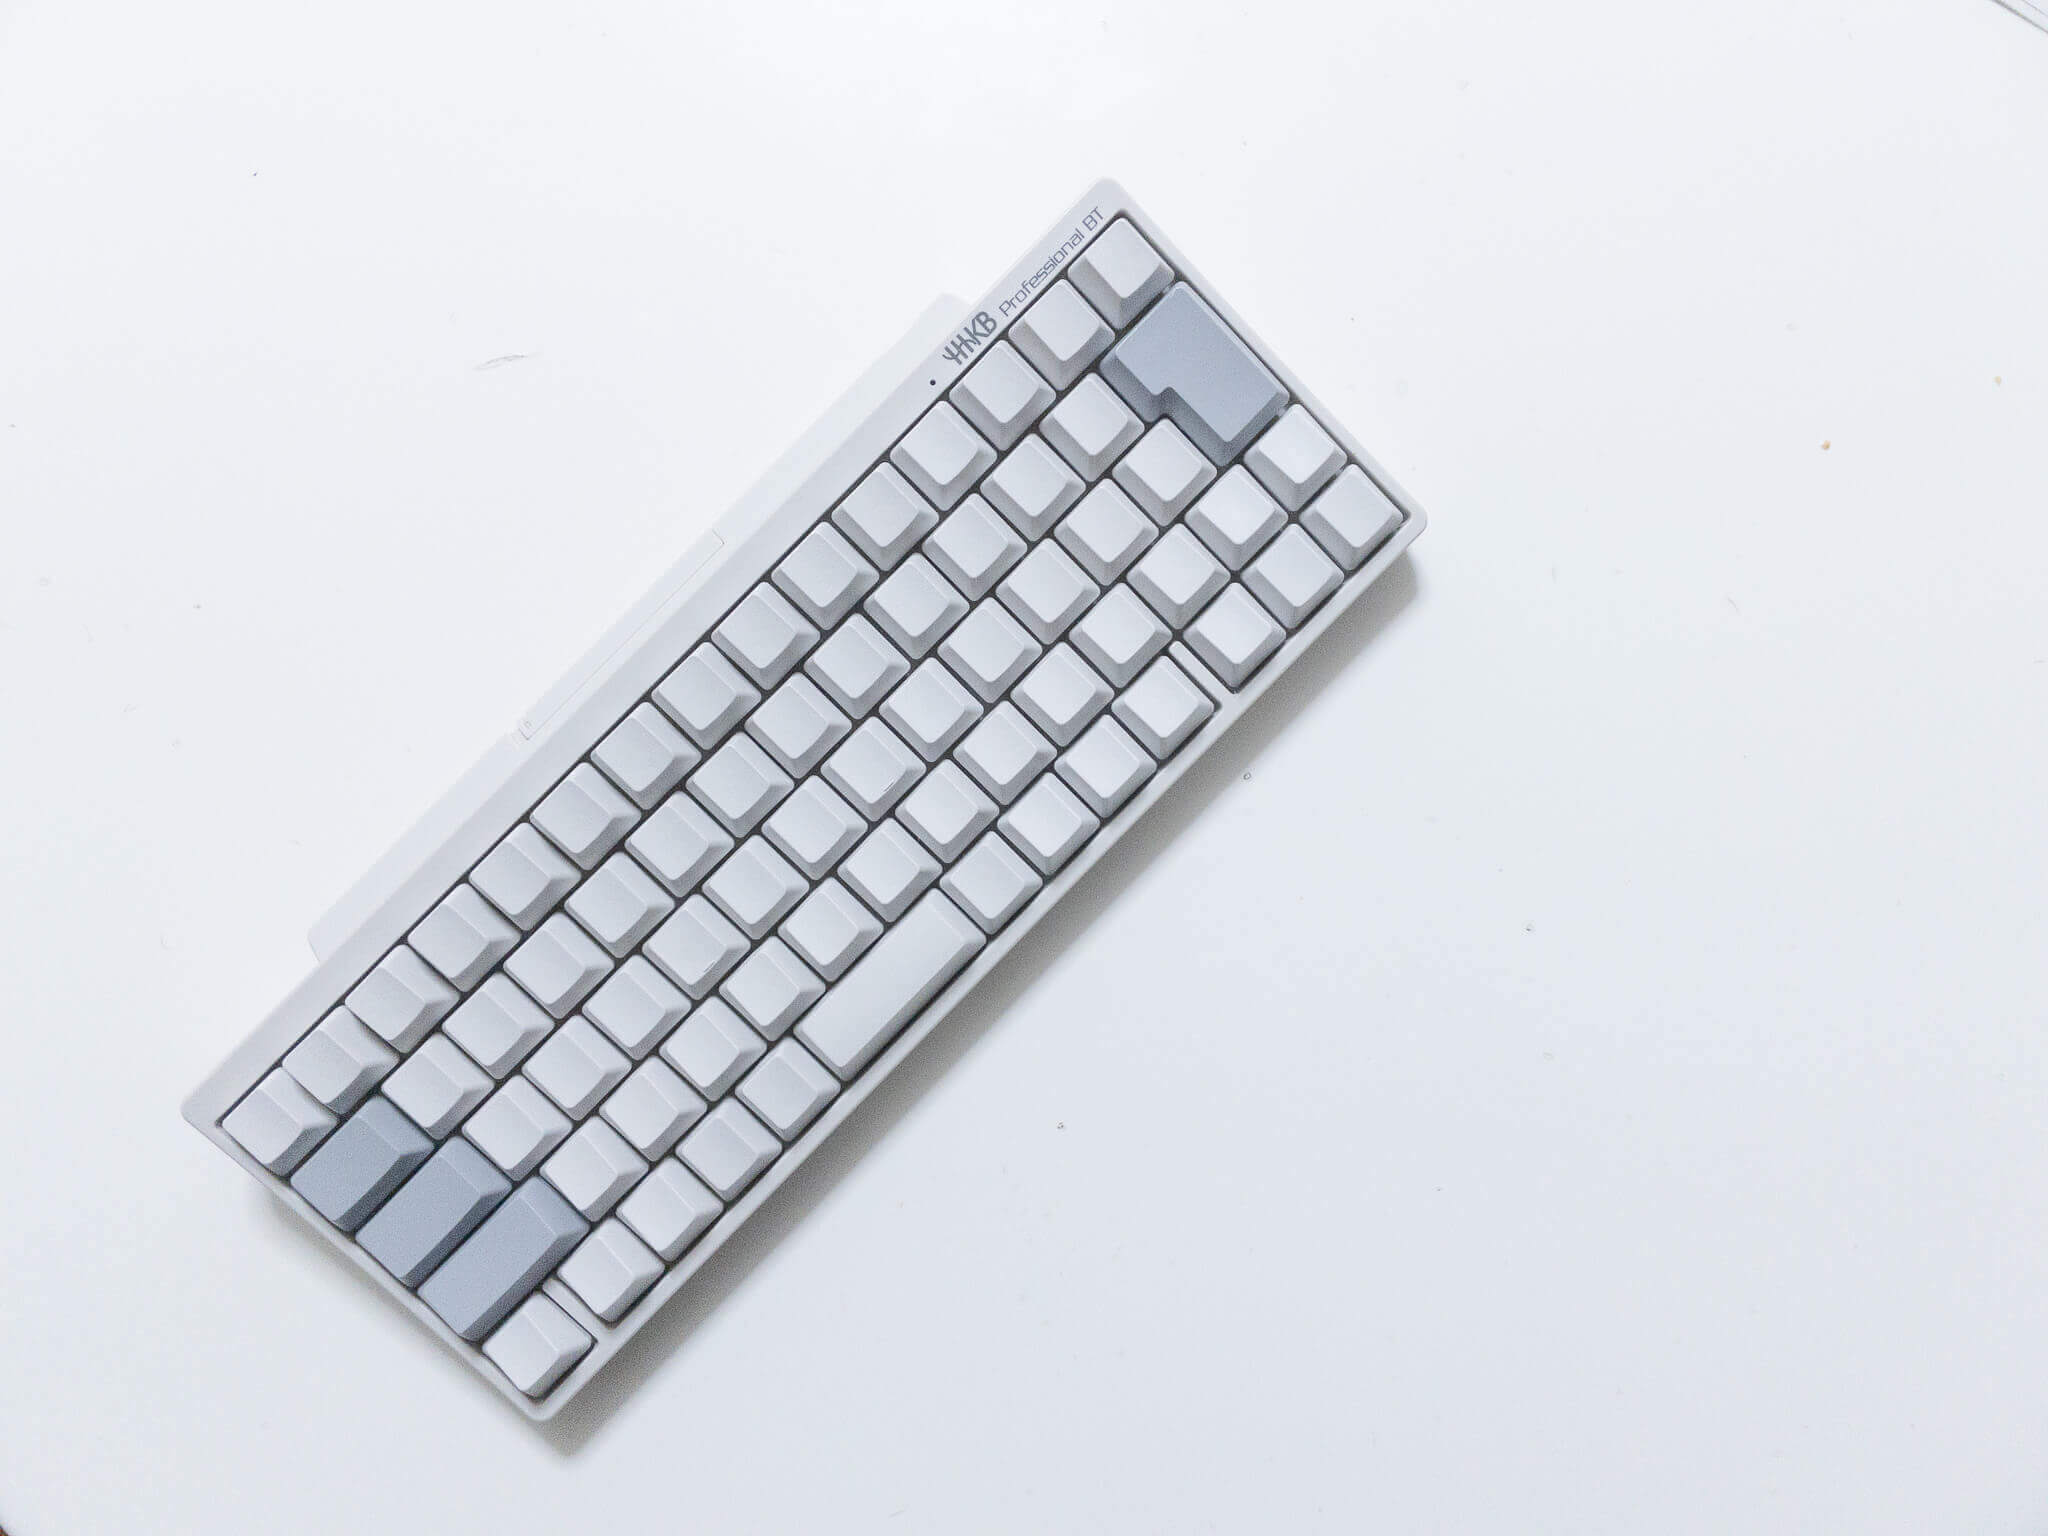 210311 hhkb key no mark 2